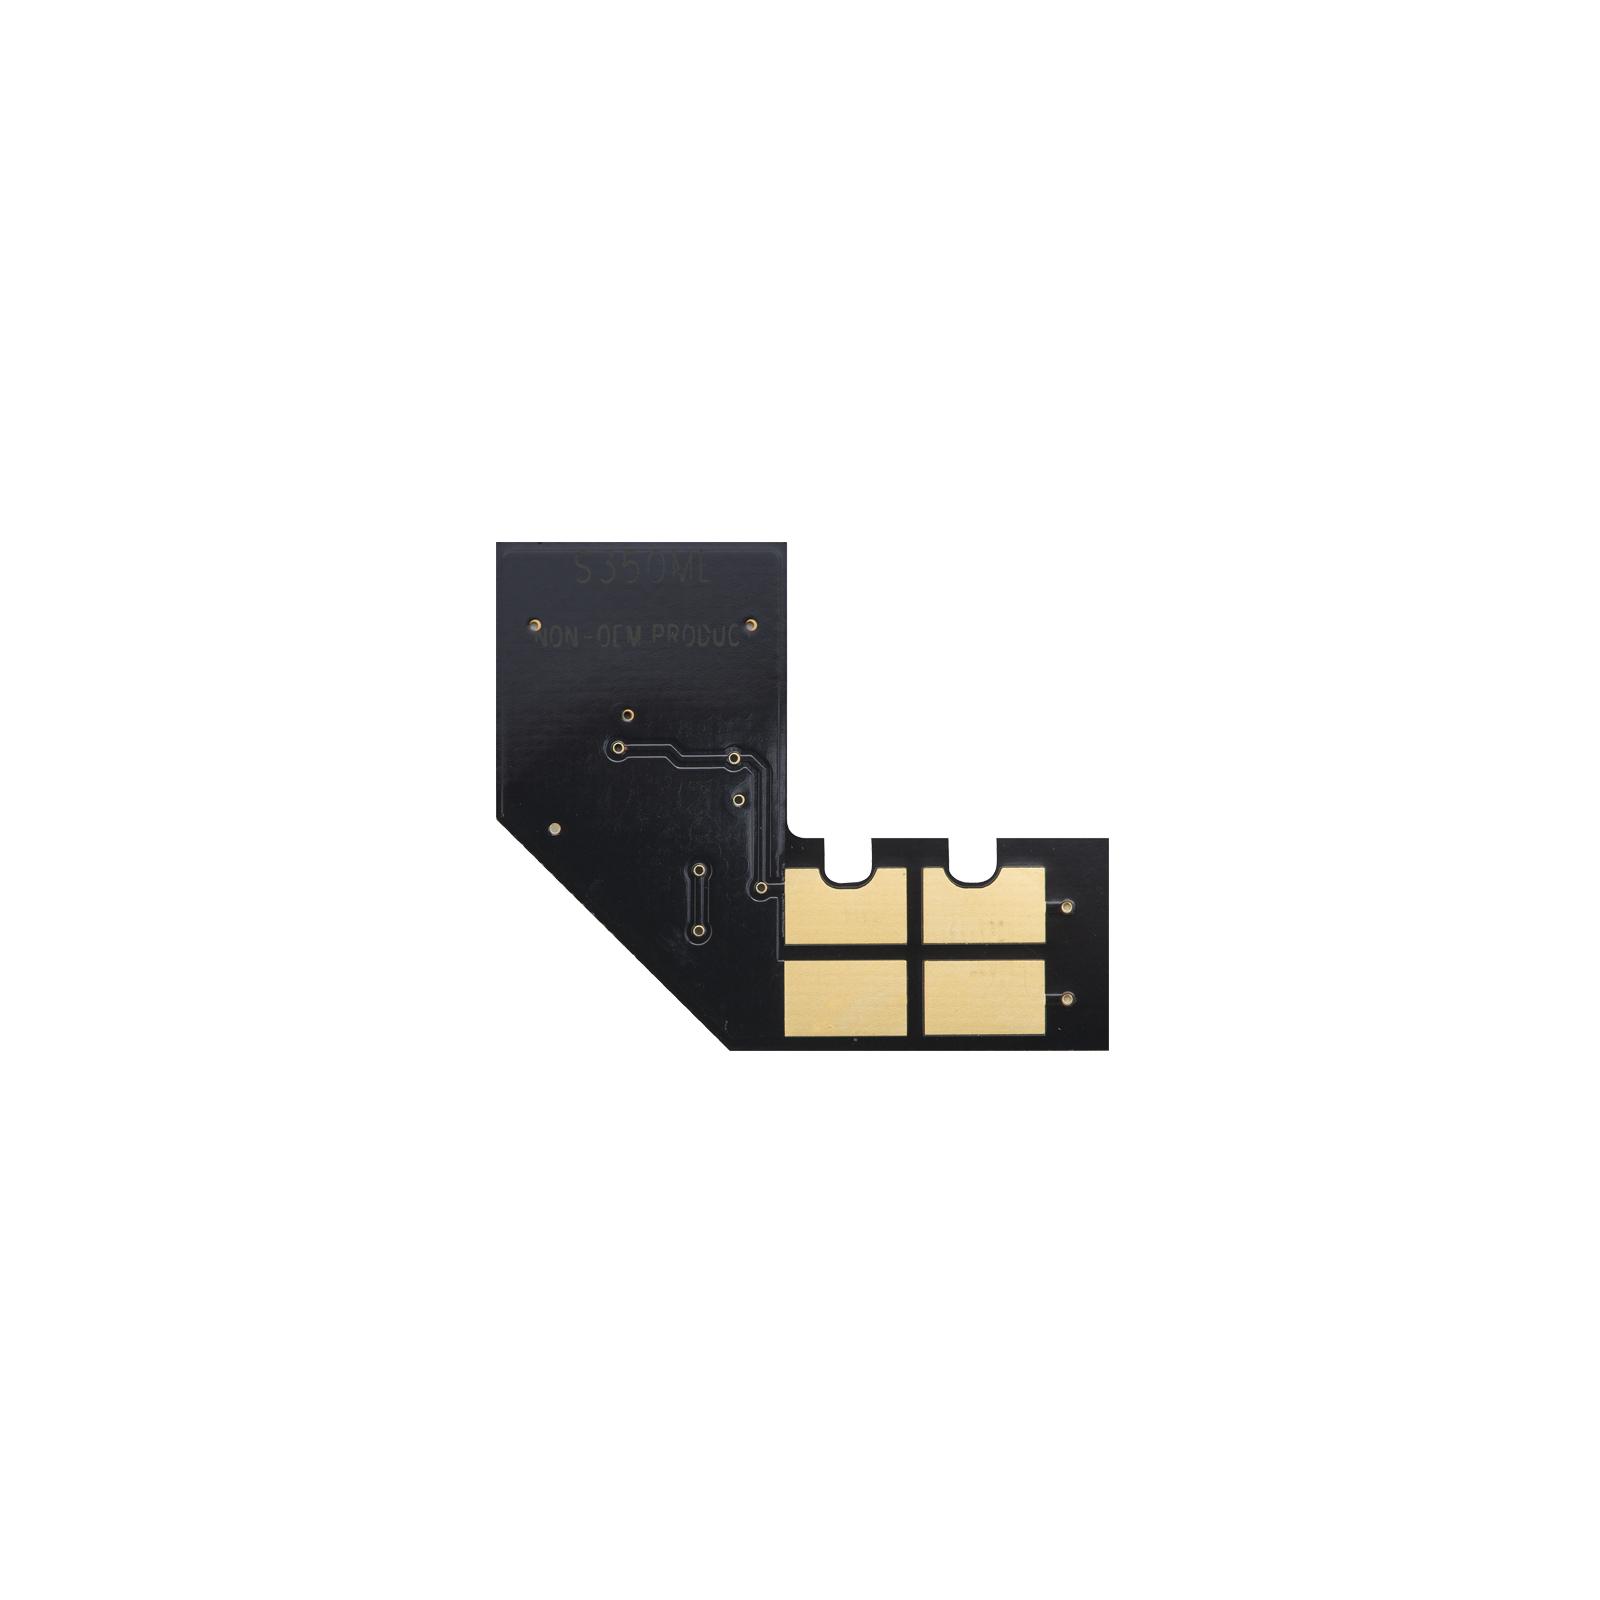 Чип для картриджа SamsungCLP-350 2k magenta Static Control (SAM350CP-MAEU)